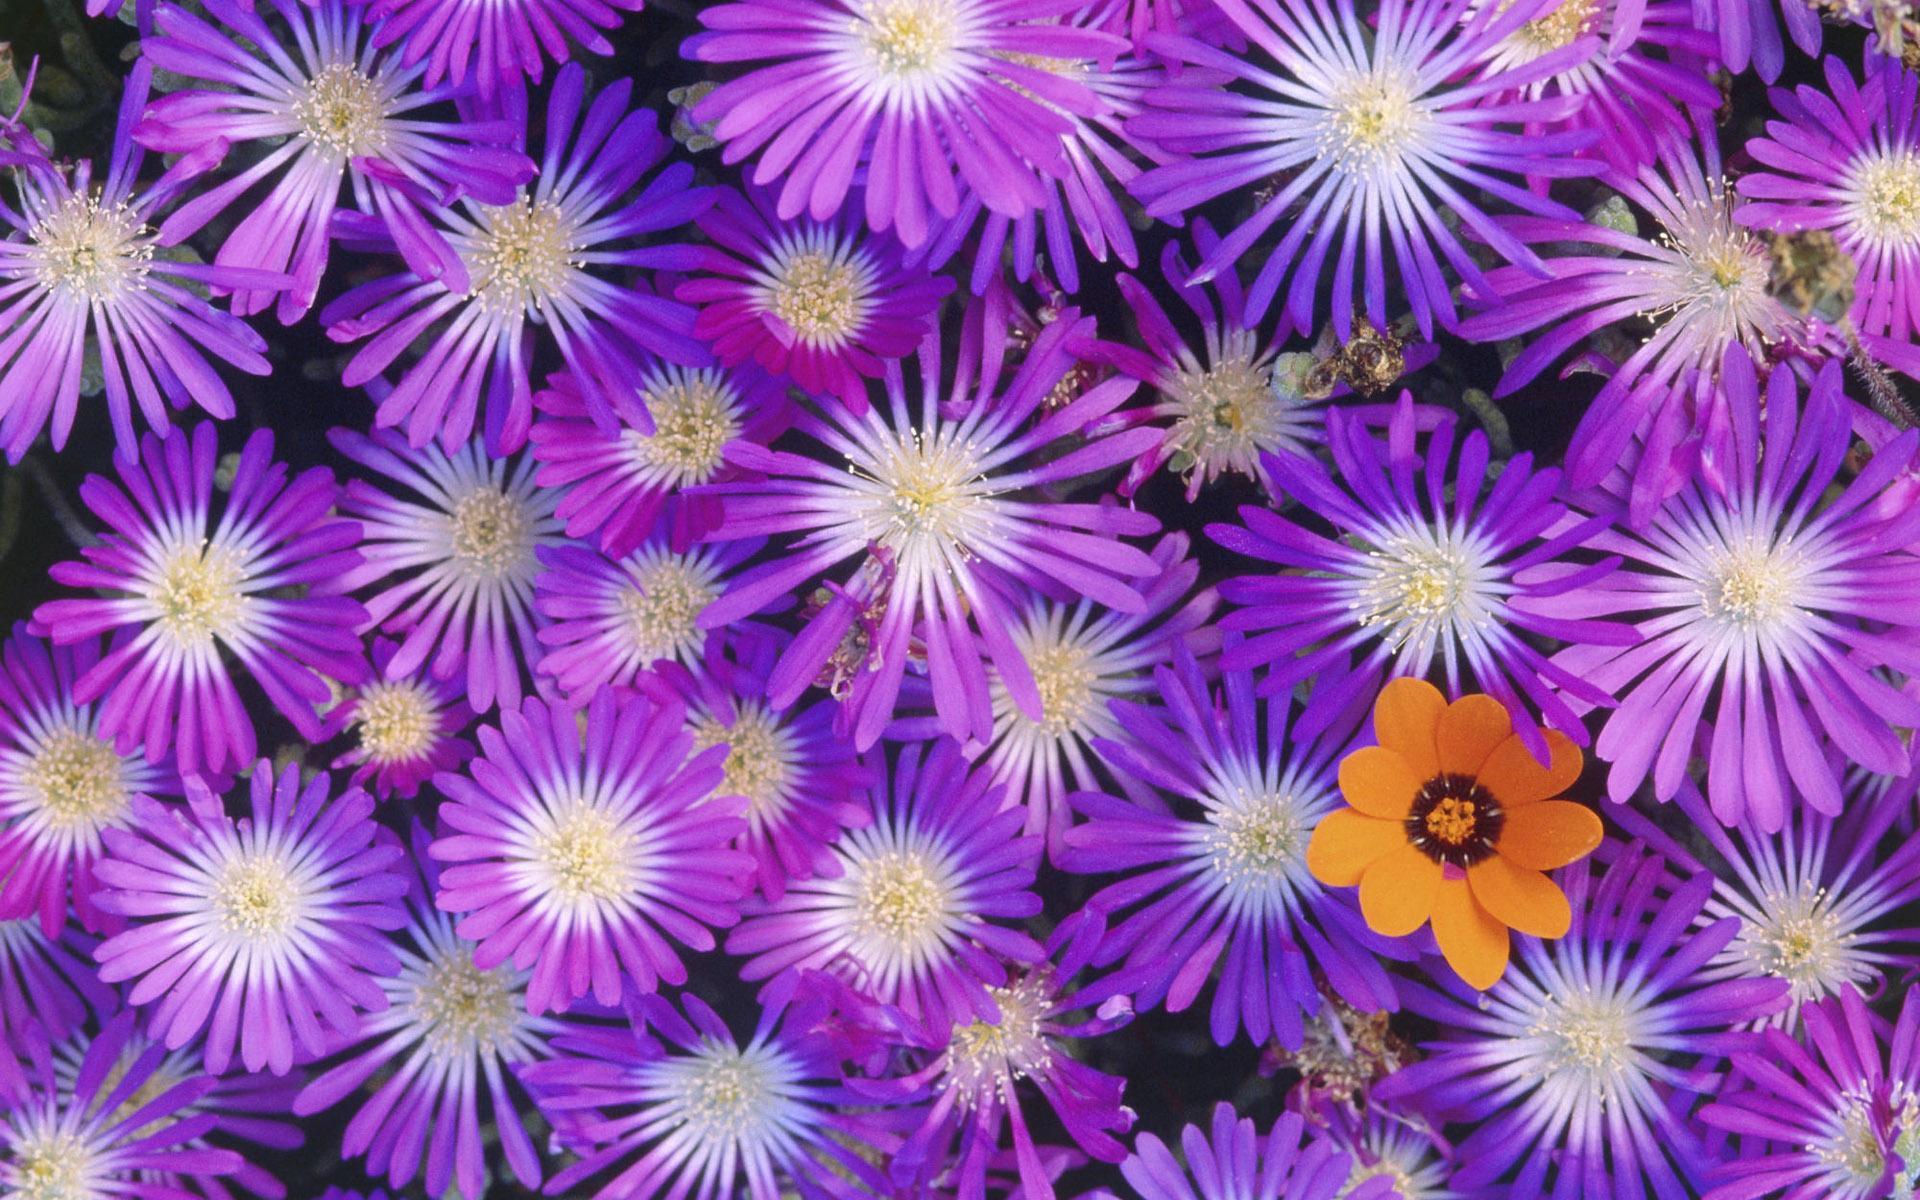 ... обои цветы букет красивых цветов 1920x1200: hq-wallpapers.ru/wallpapers/flowers/pic22614_raz1920x1200